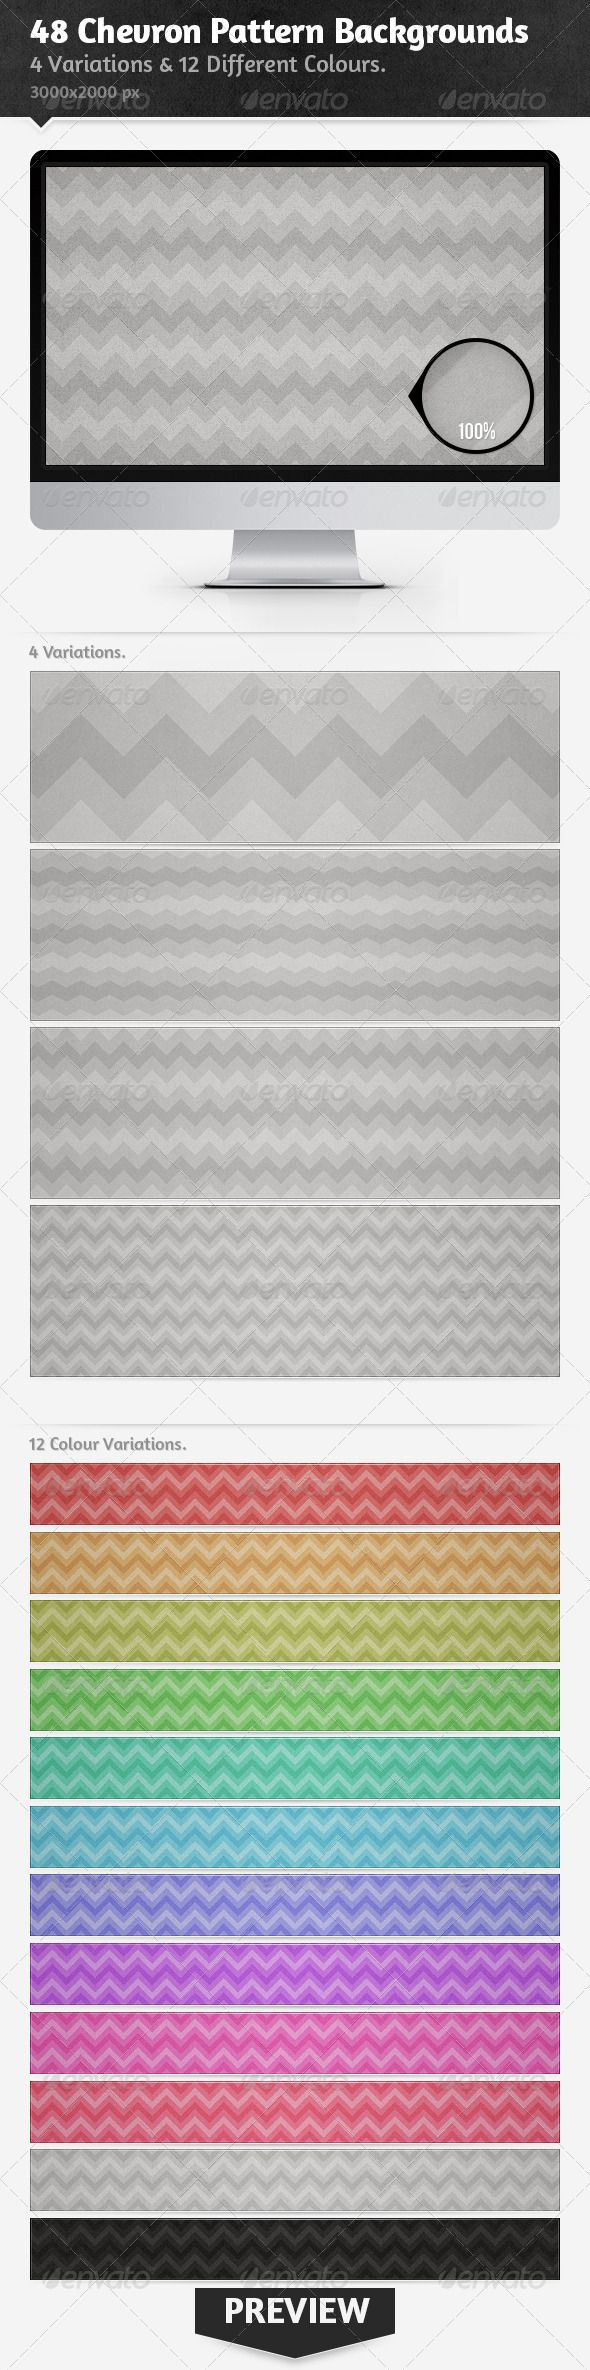 48 Chevron Pattern Backgrounds